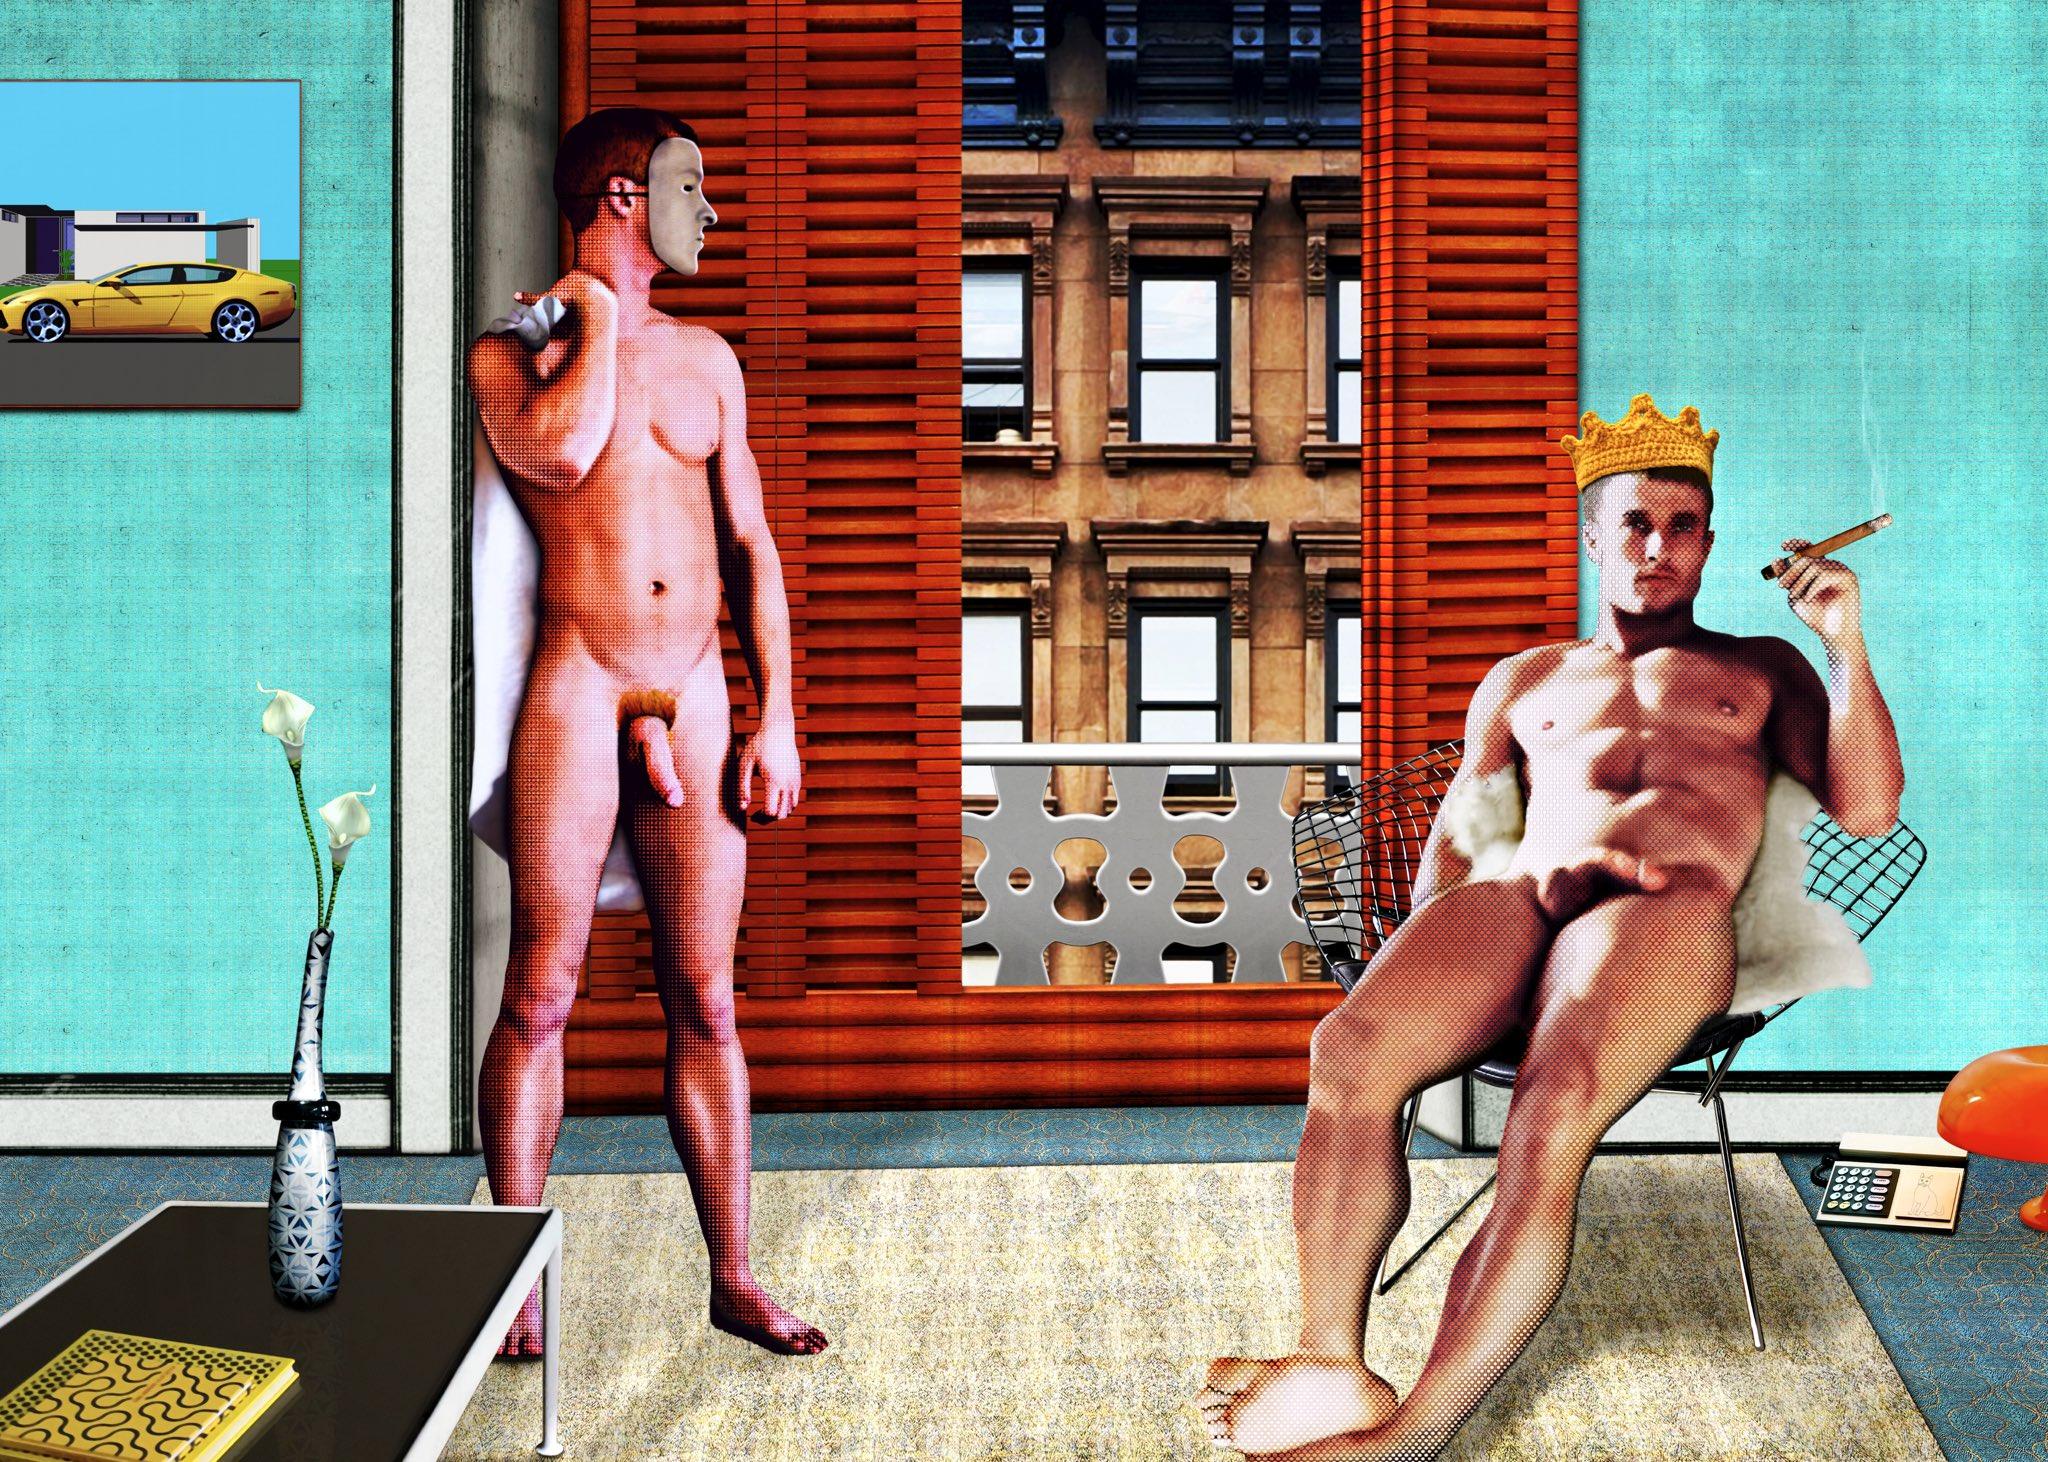 New work based on #Hockney #art #men #gaymen #print #cprint https://t.co/rAouXRk7z6